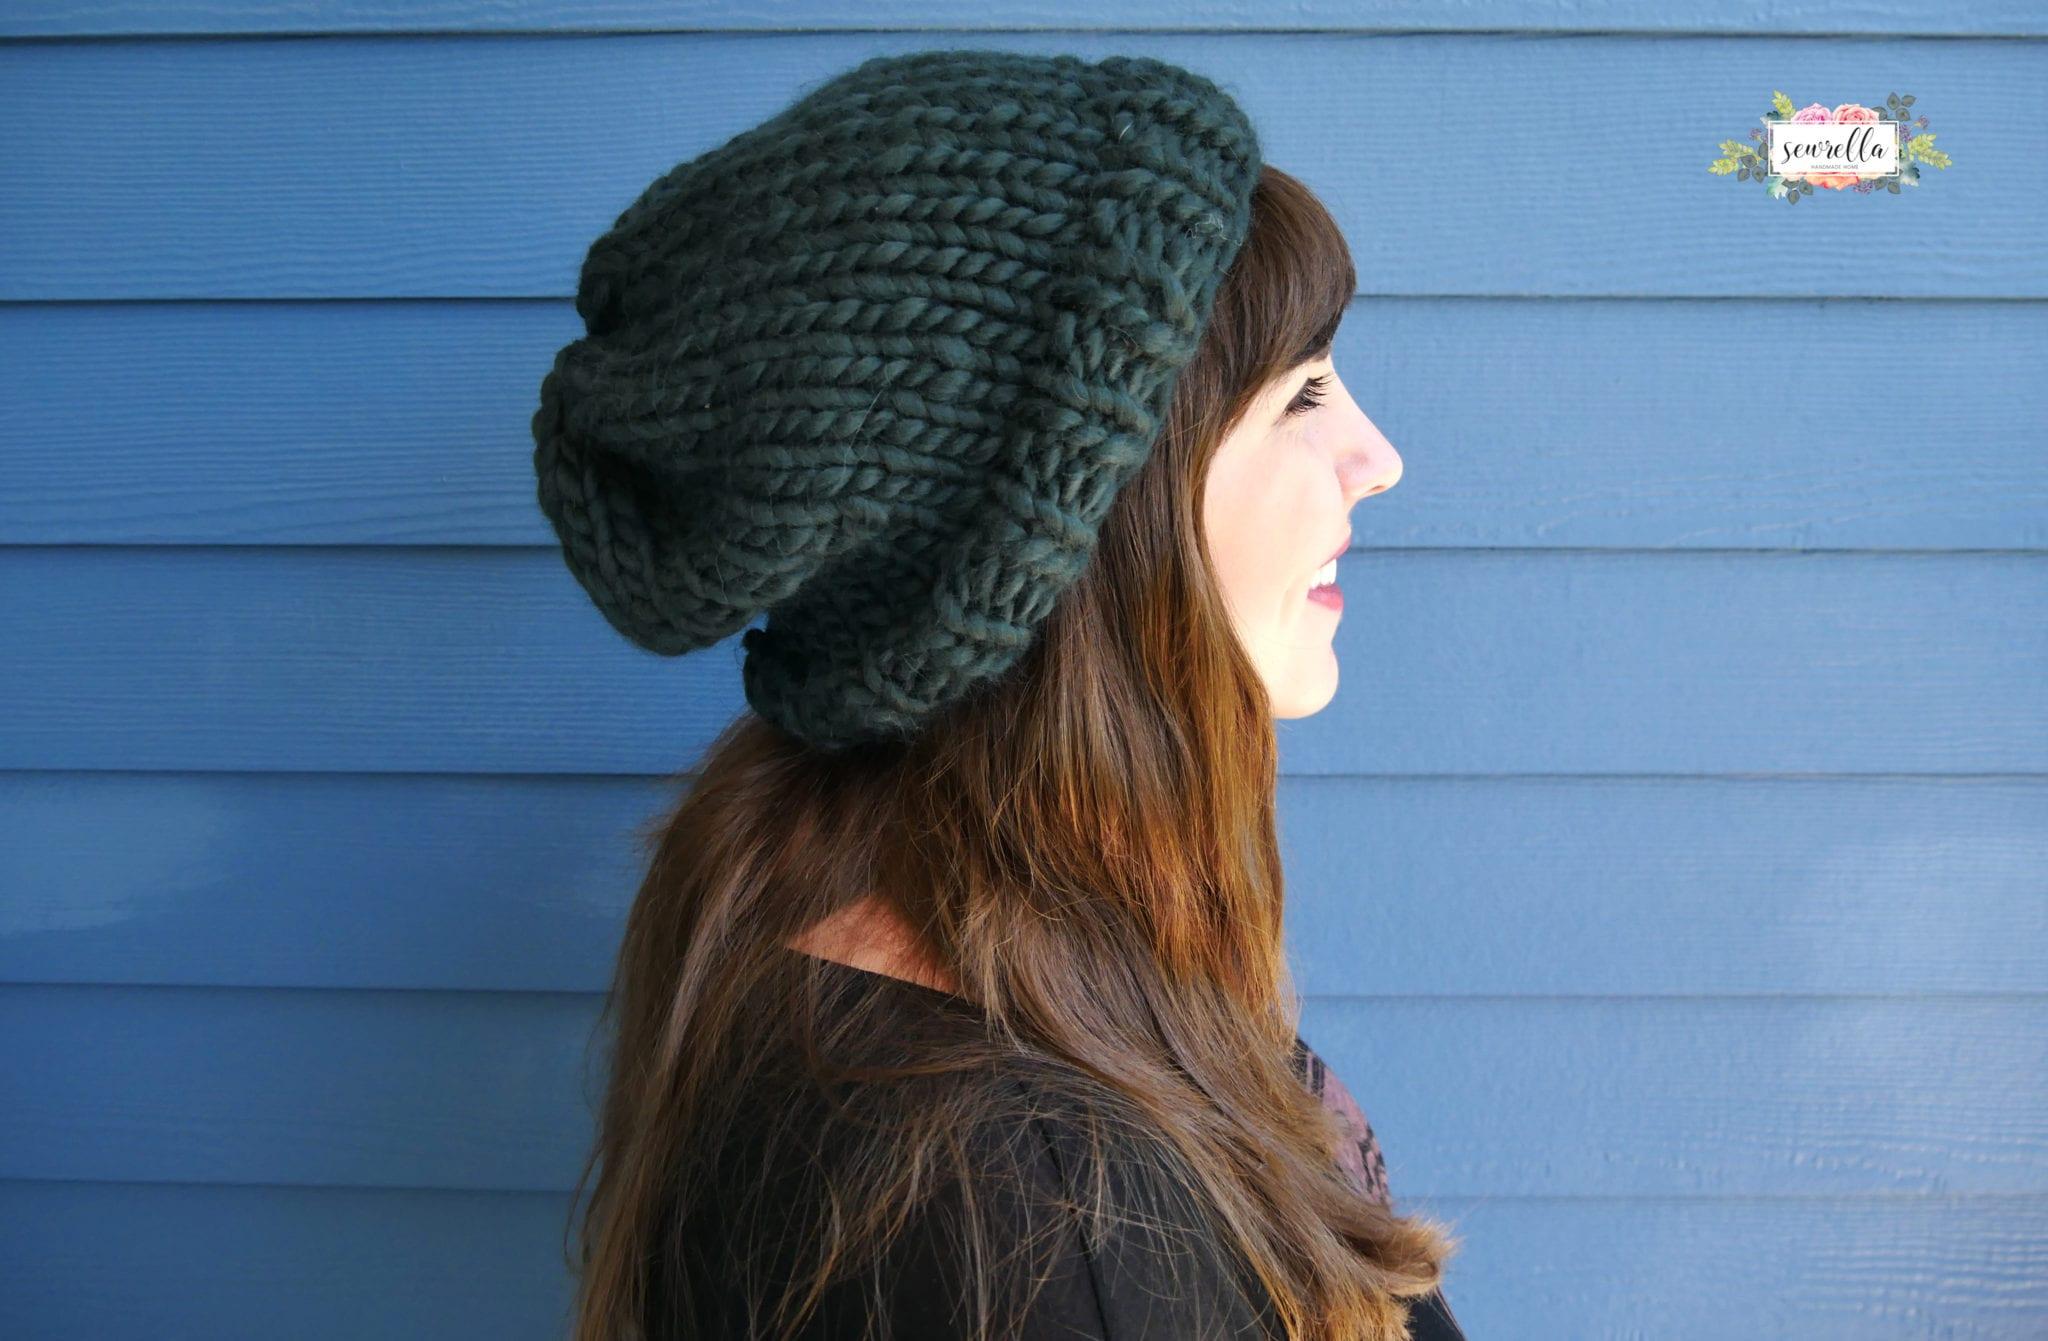 How to Knit a Basic Hat - Sewrella ed7c40e57d94